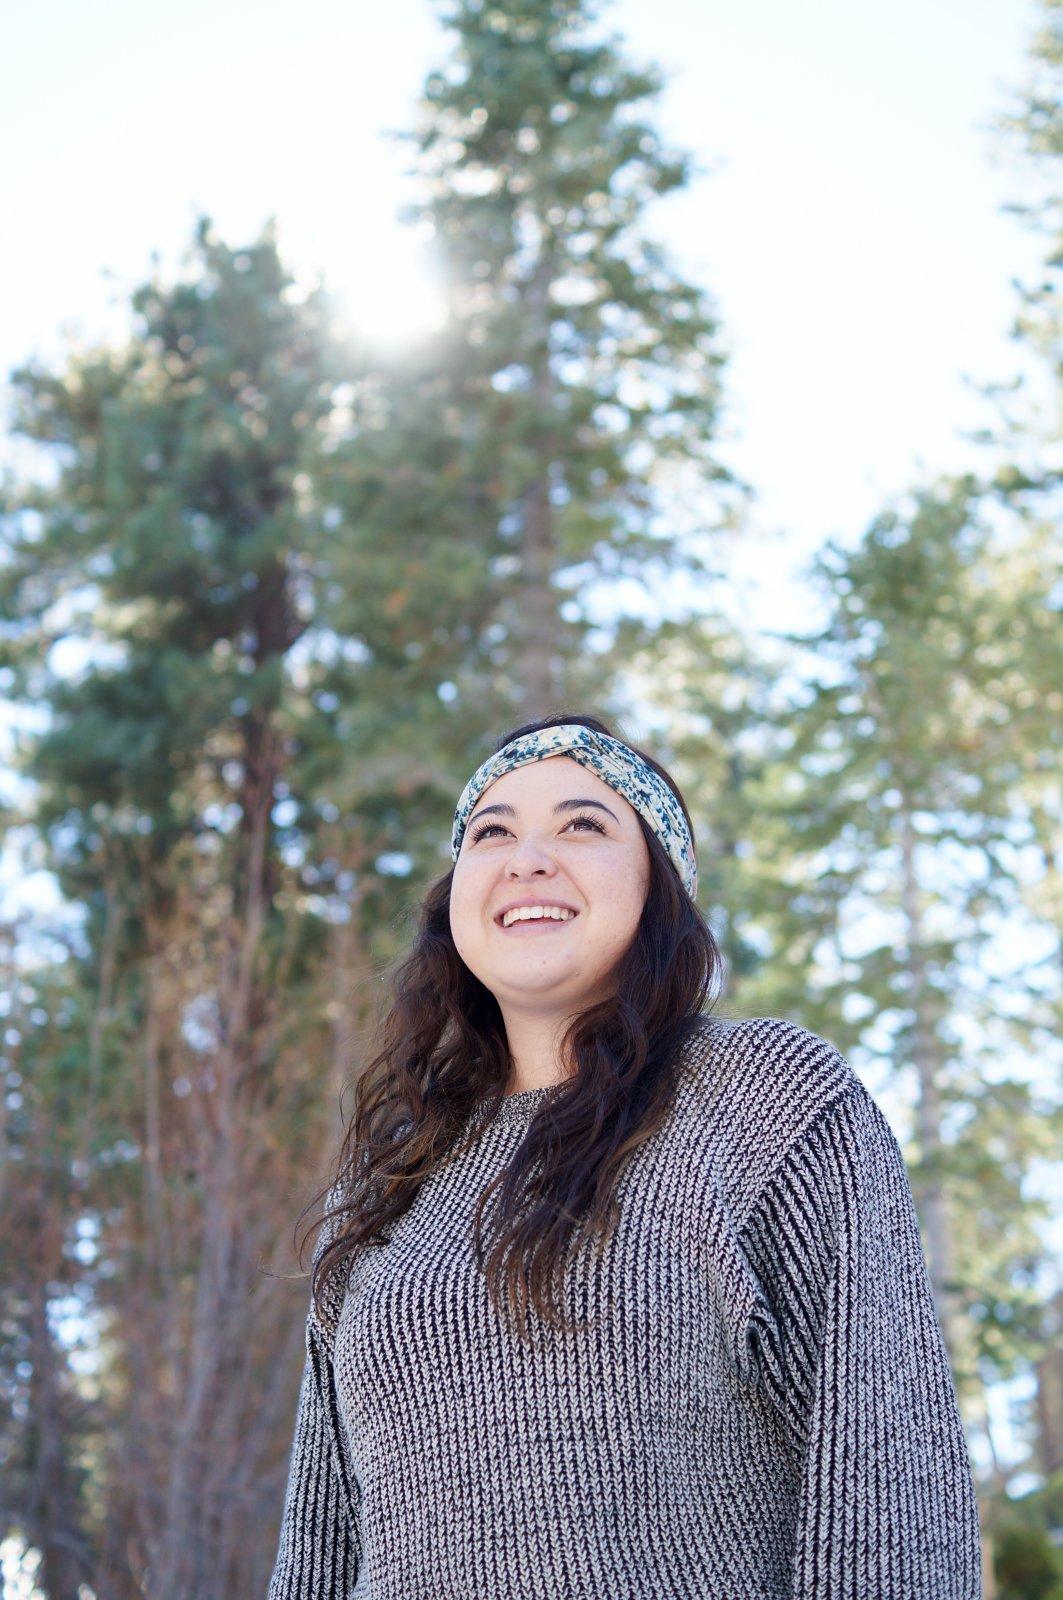 More Smiles at Big Bear Lake